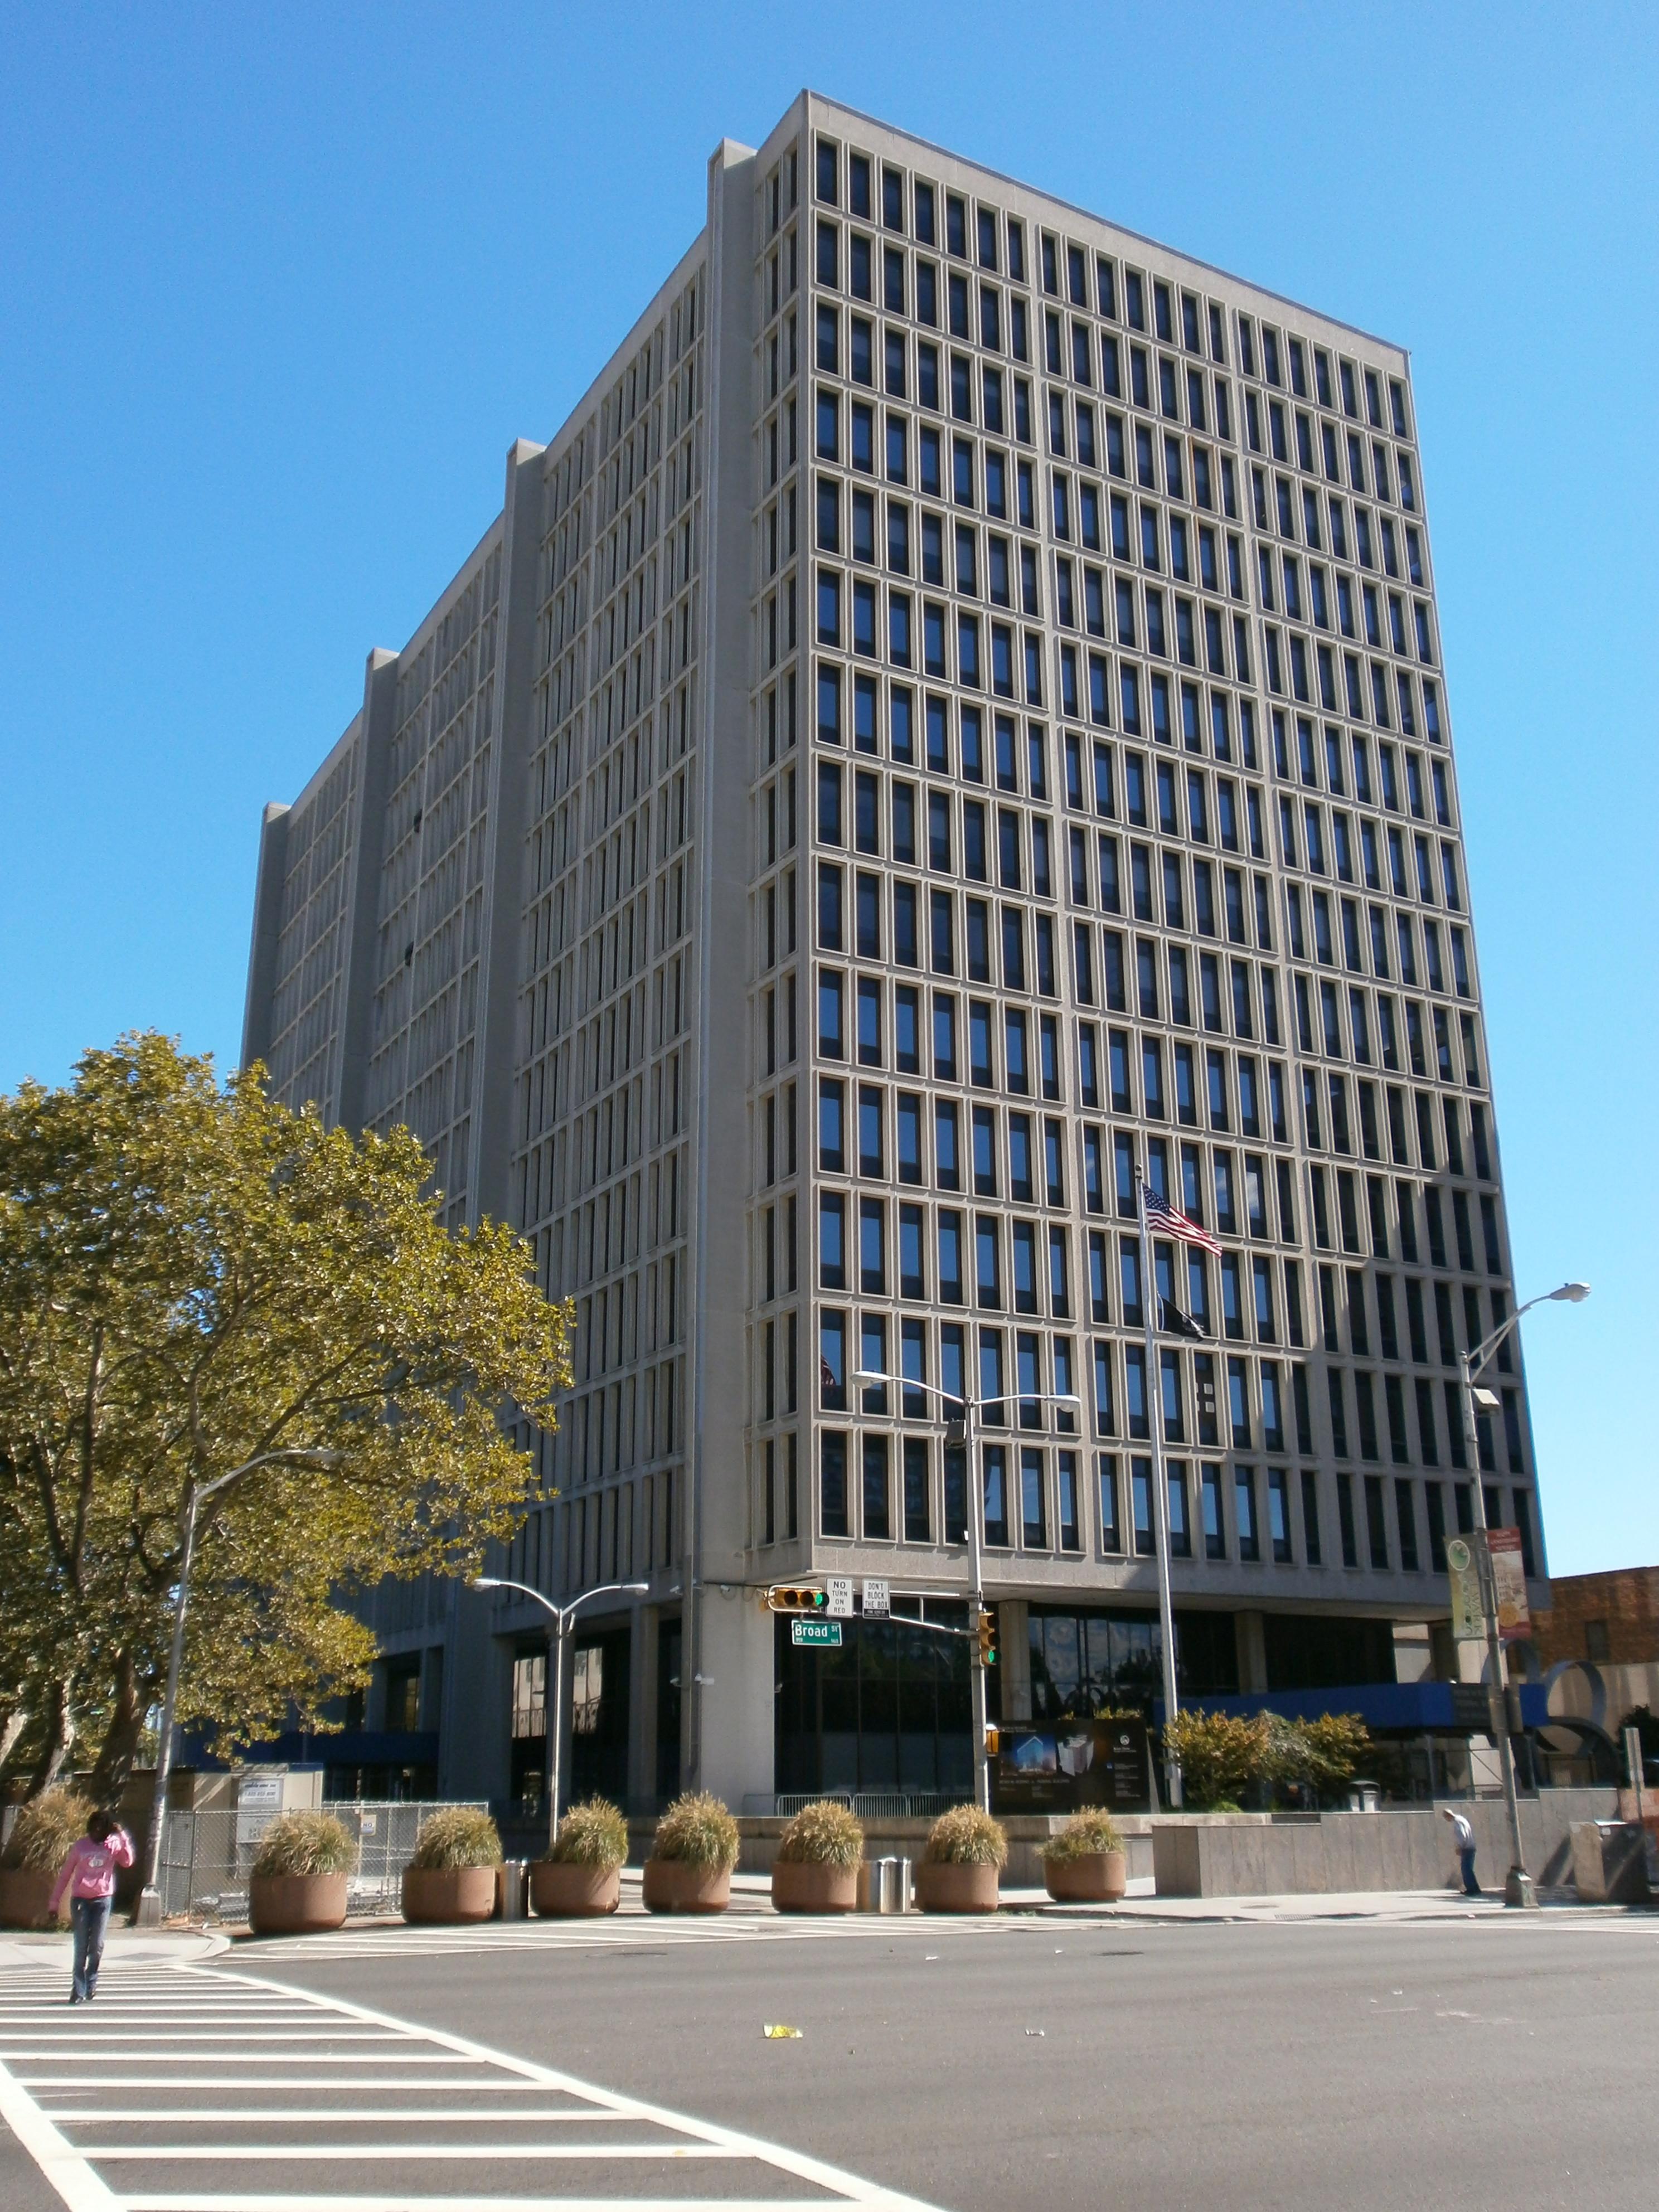 File:Rodino Federal Building Newark.JPG - Wikimedia Commons